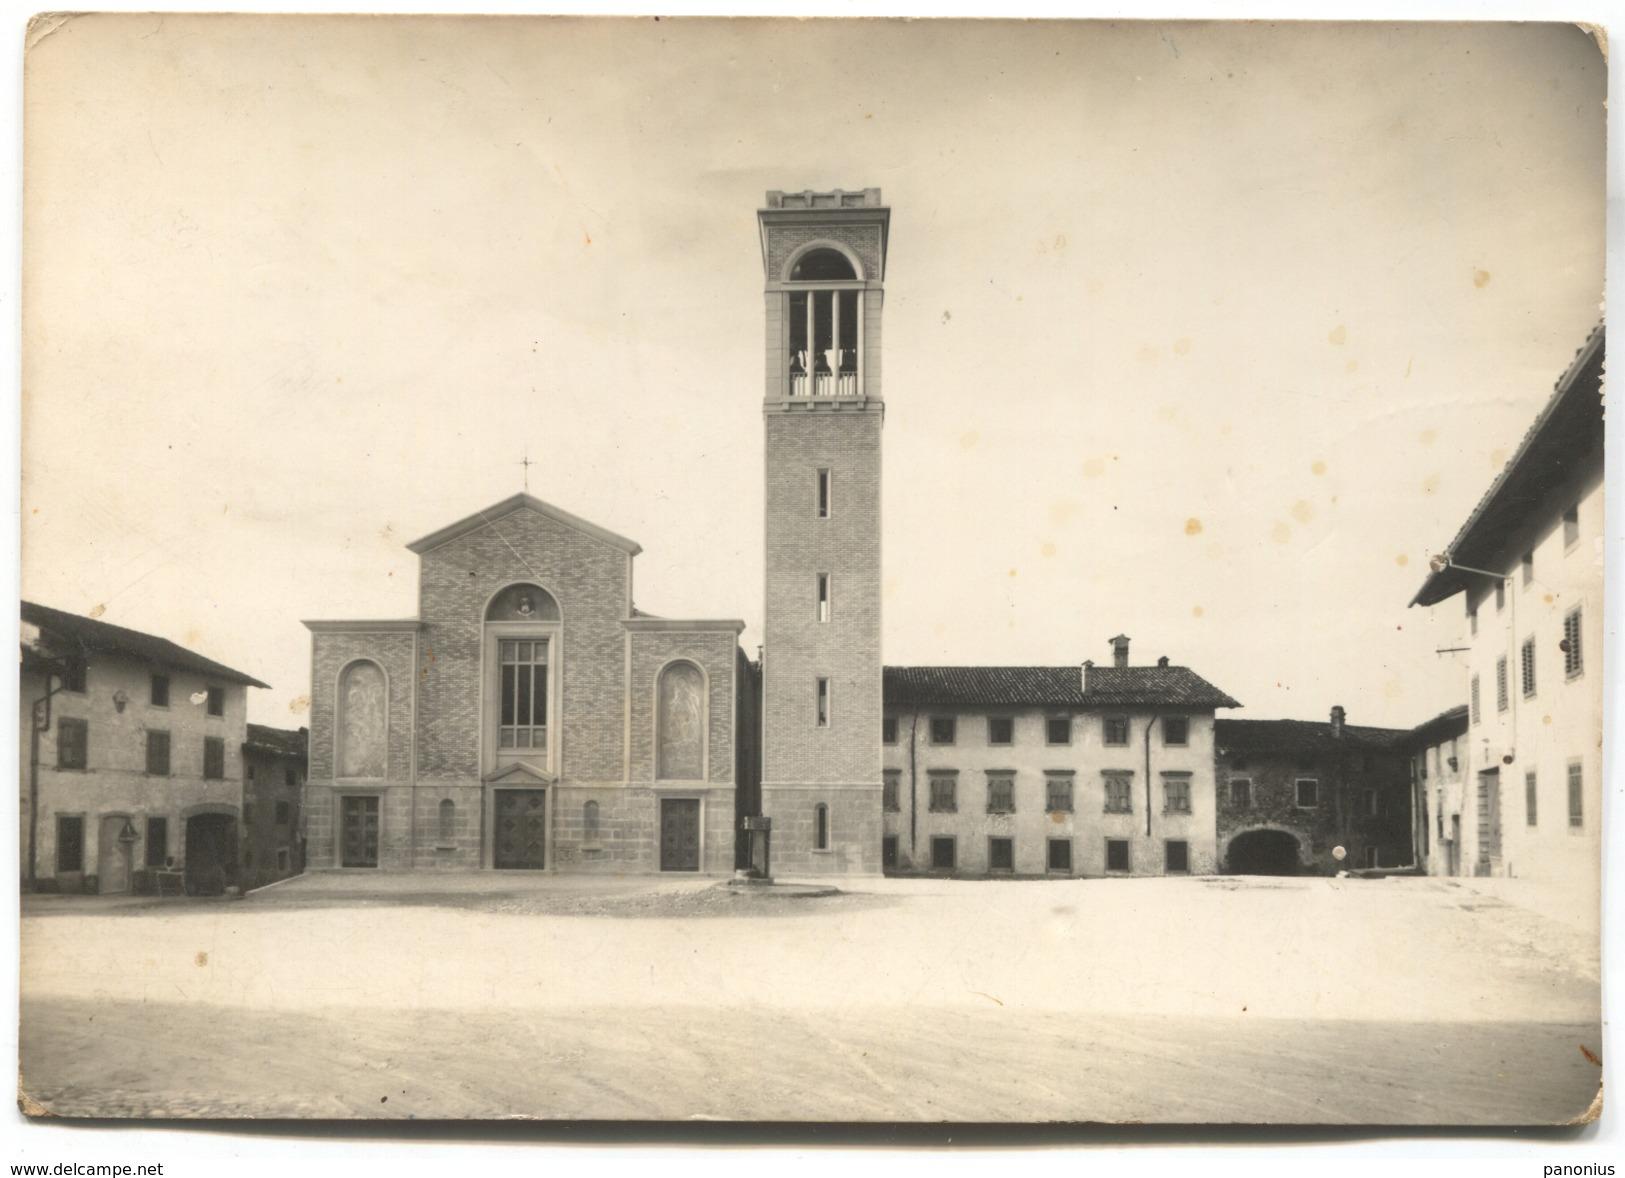 BUIA / UDINE - ITALY, CHIESA, PORTO - Udine